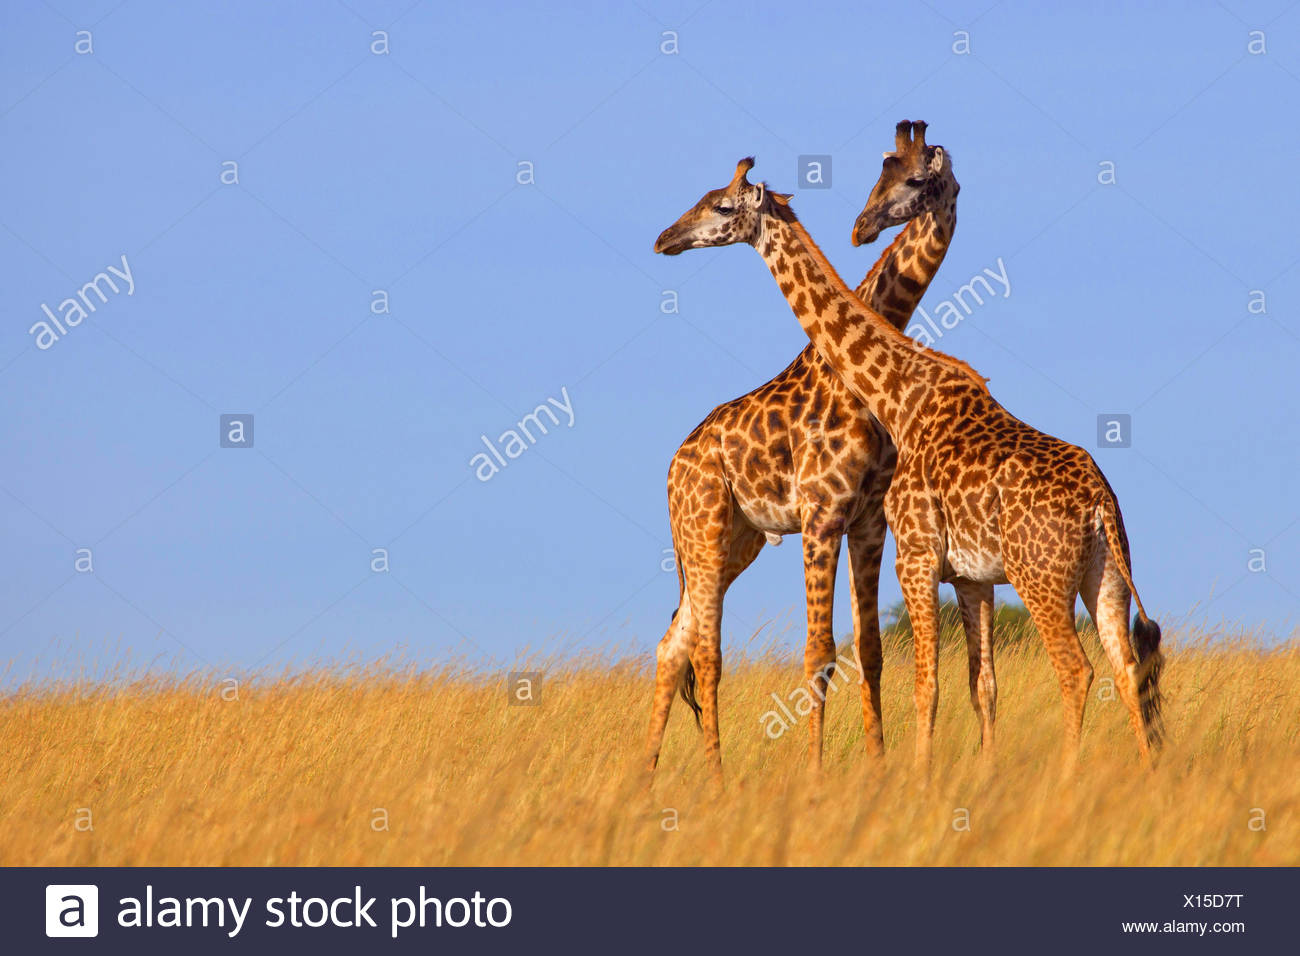 Les Masais Girafe (Giraffa camelopardalis tippelskirchi), deux girafes dans la savane, Kenya, Masai Mara National Park Photo Stock